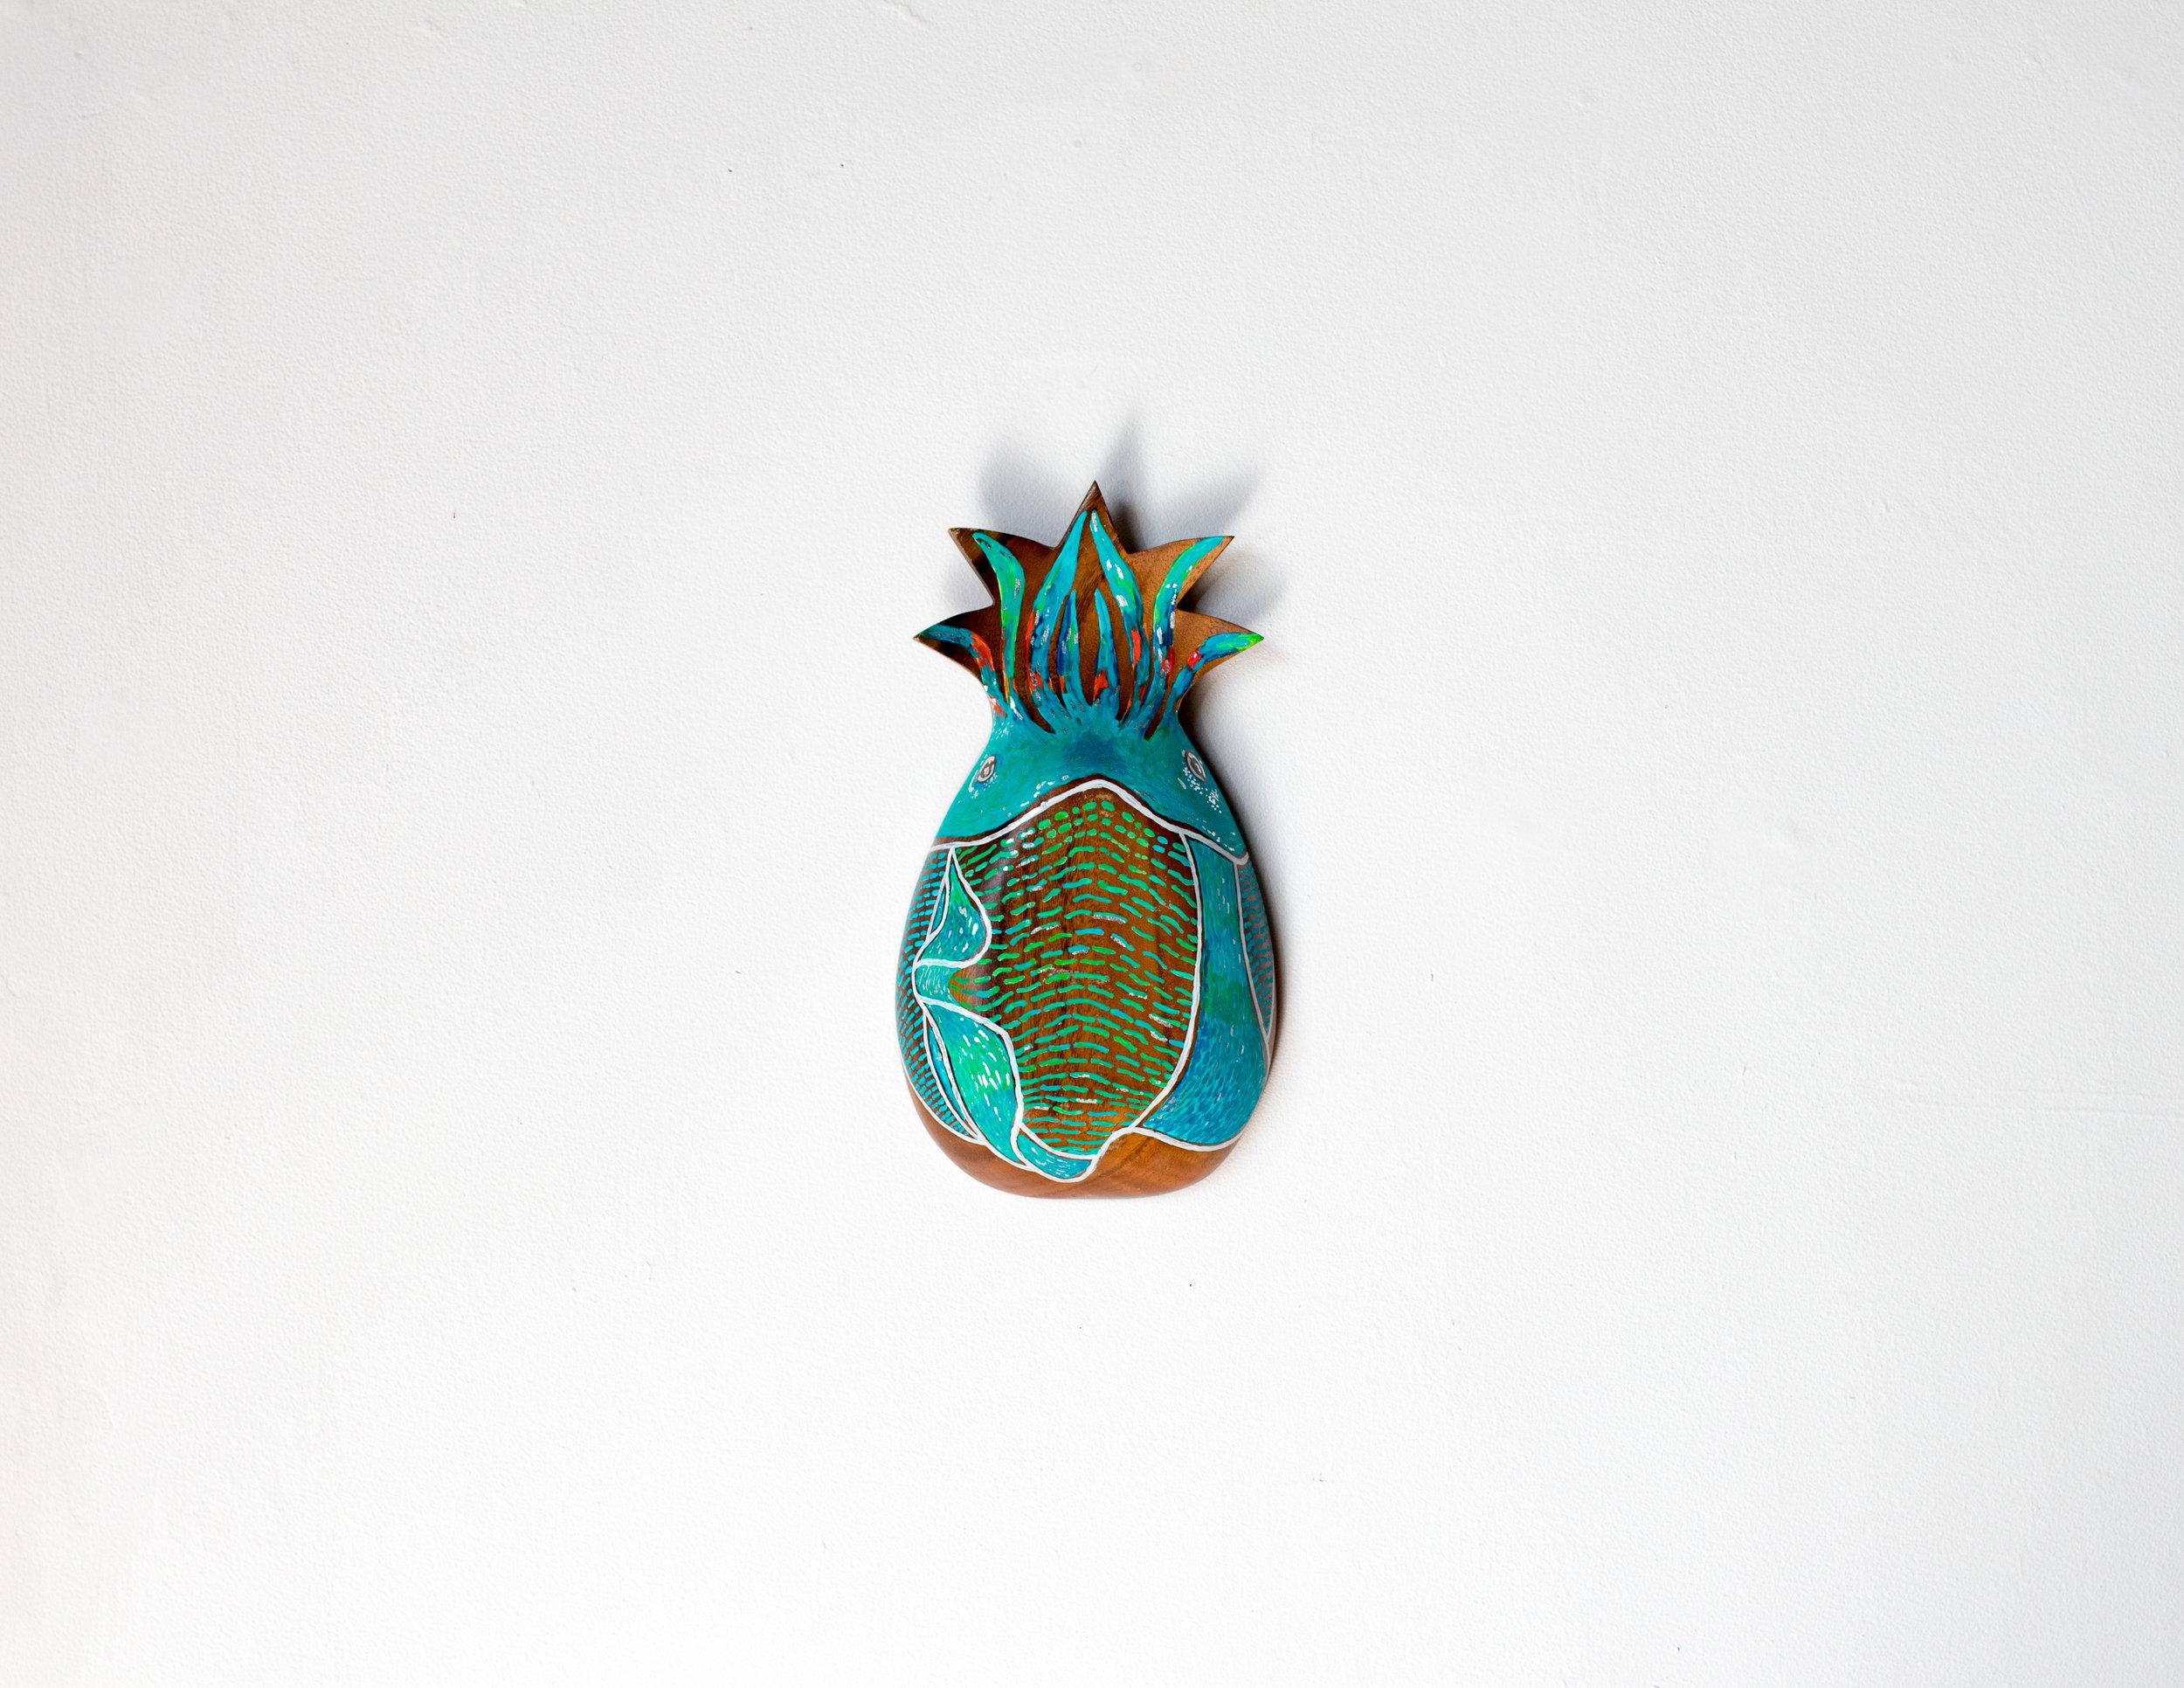 Cairns 12 - Francoise Lane 'PineAPPLESquid' 2018, acrylic & silver leaf guilding on wood.jpg